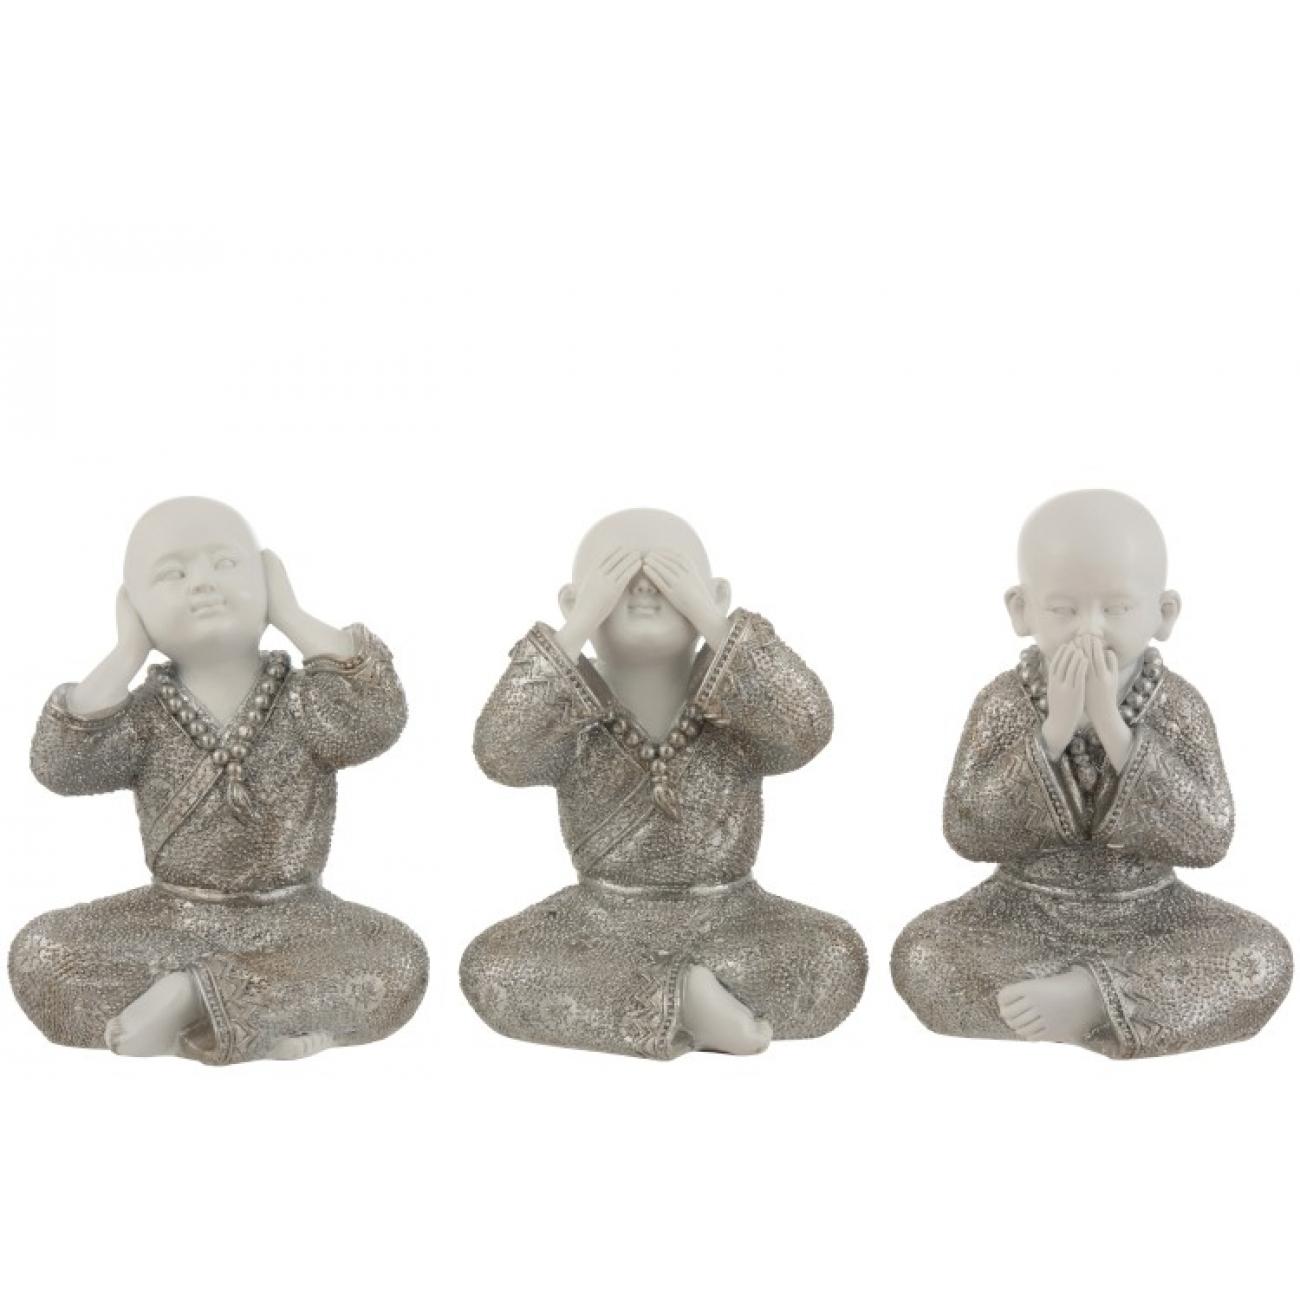 Набор статуэток J-LINE три монаха  не слышу не вижу не говорю серебристого цвета 22 см